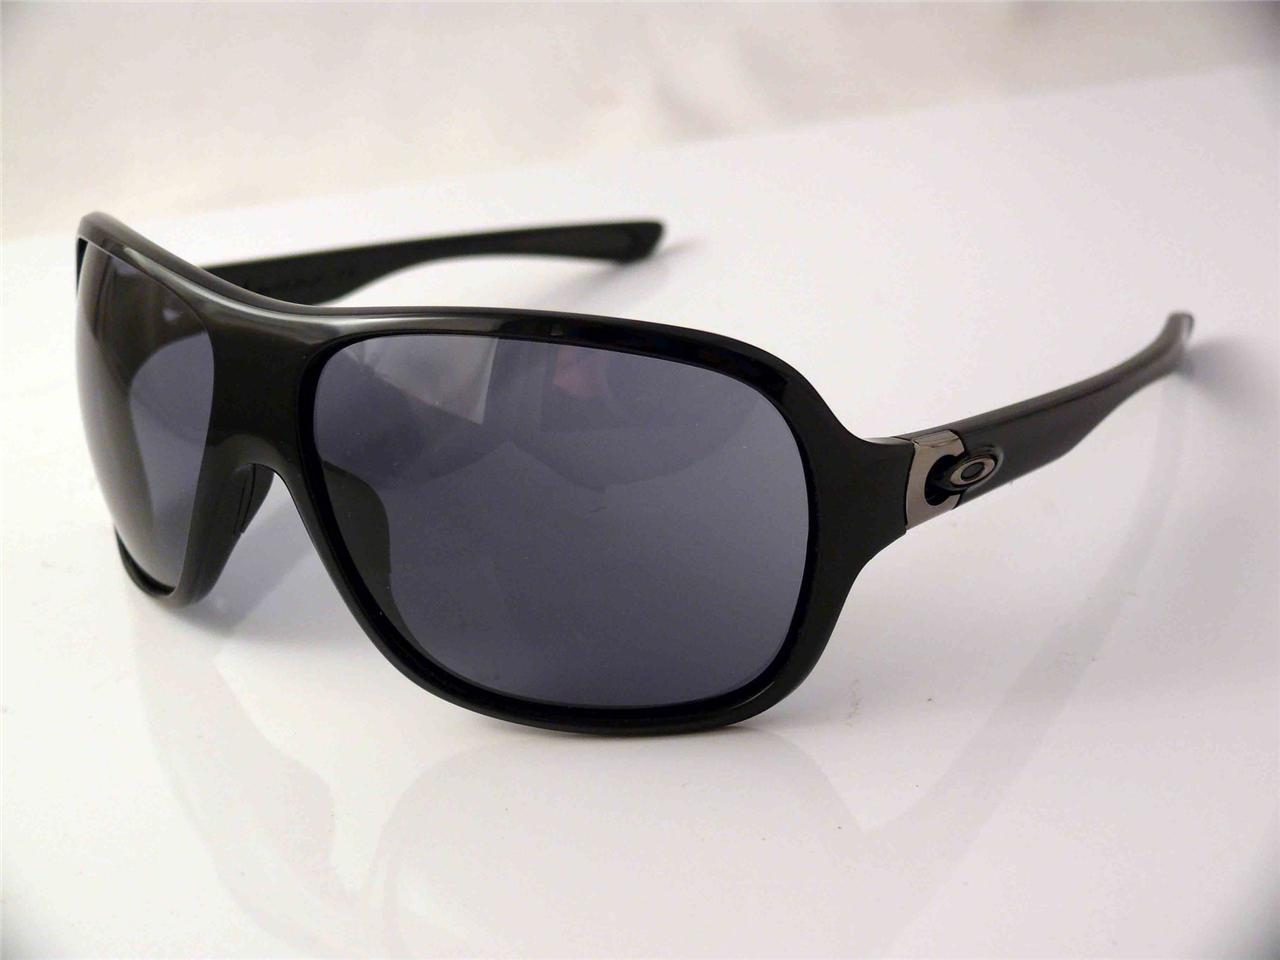 Oakley Underspin Ladies Sunglasses Black Frame Grey Lens ...